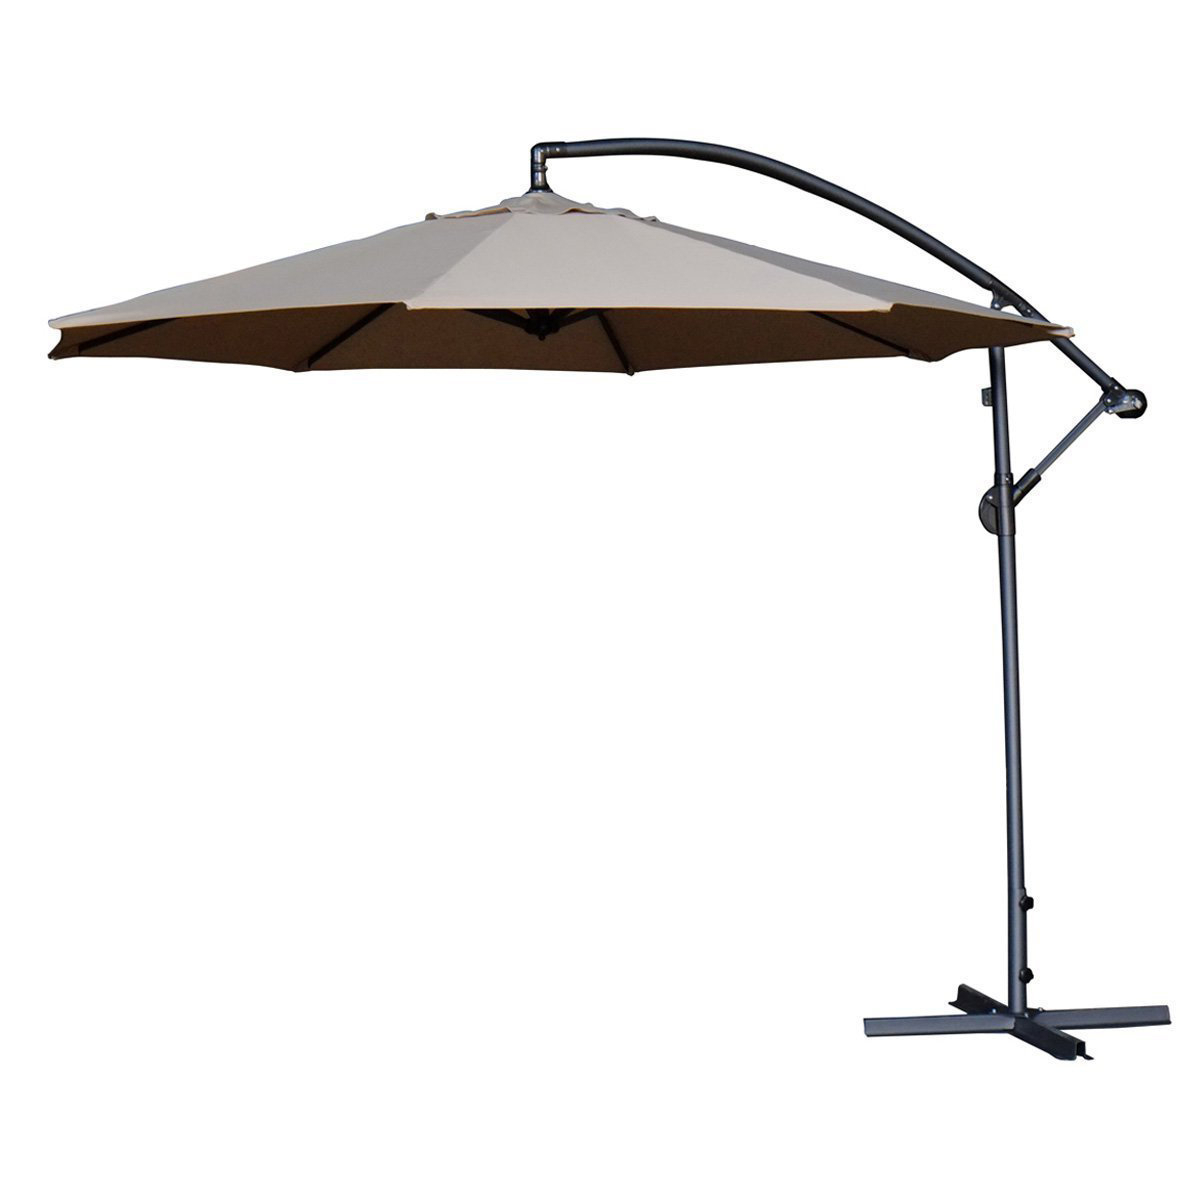 Bondi Square Cantilever Umbrellas Throughout Most Popular Irven 10' Cantilever Umbrella (View 20 of 20)